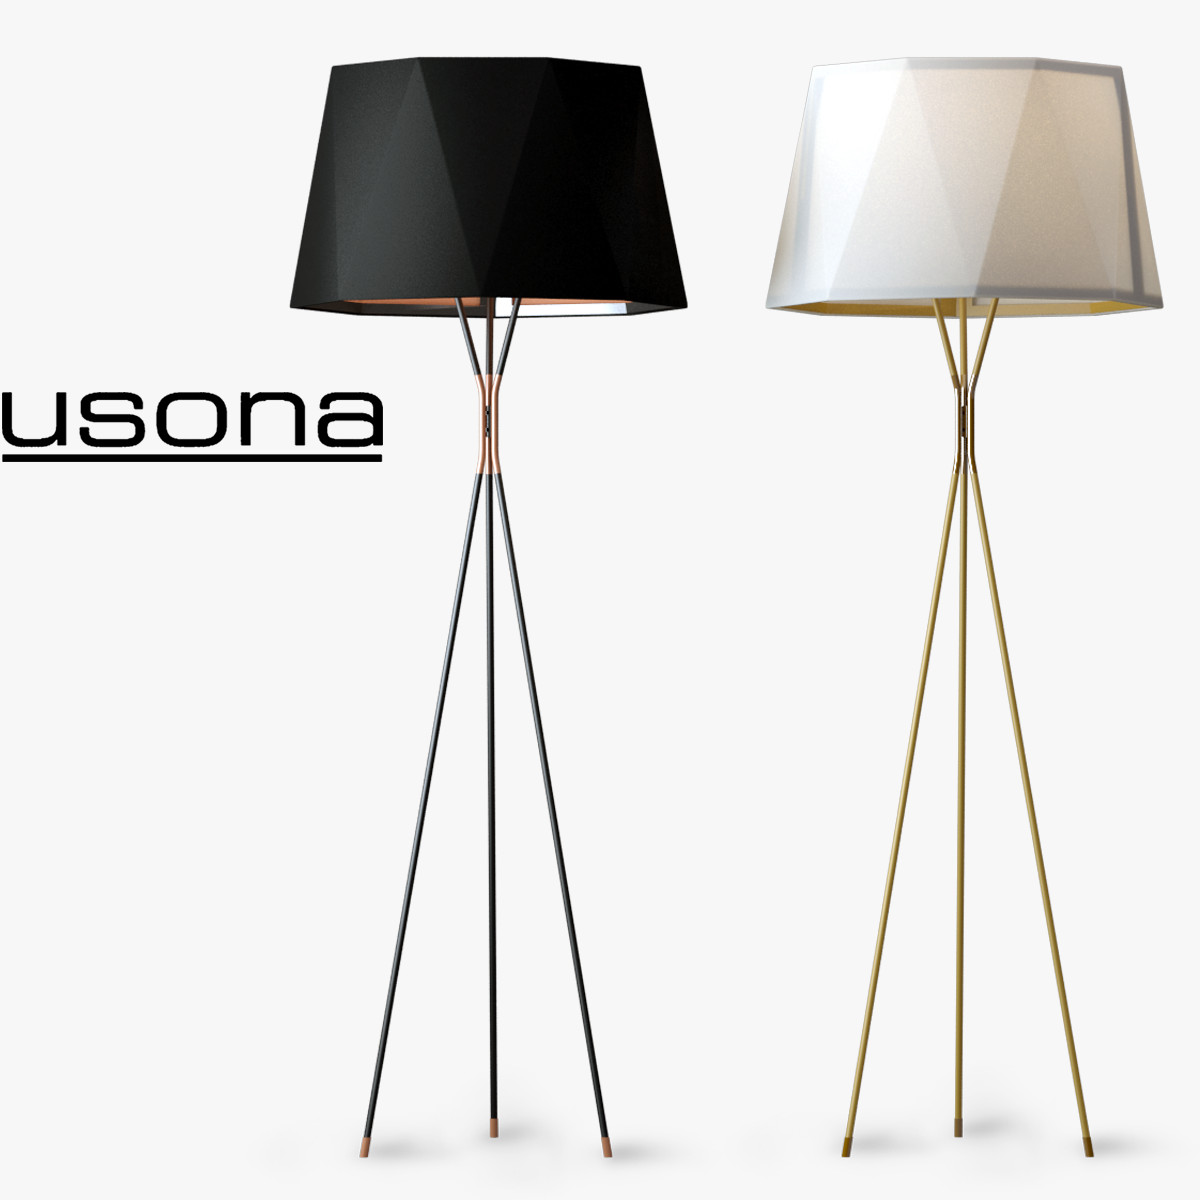 3d Model Usona Floor Lamp 13309